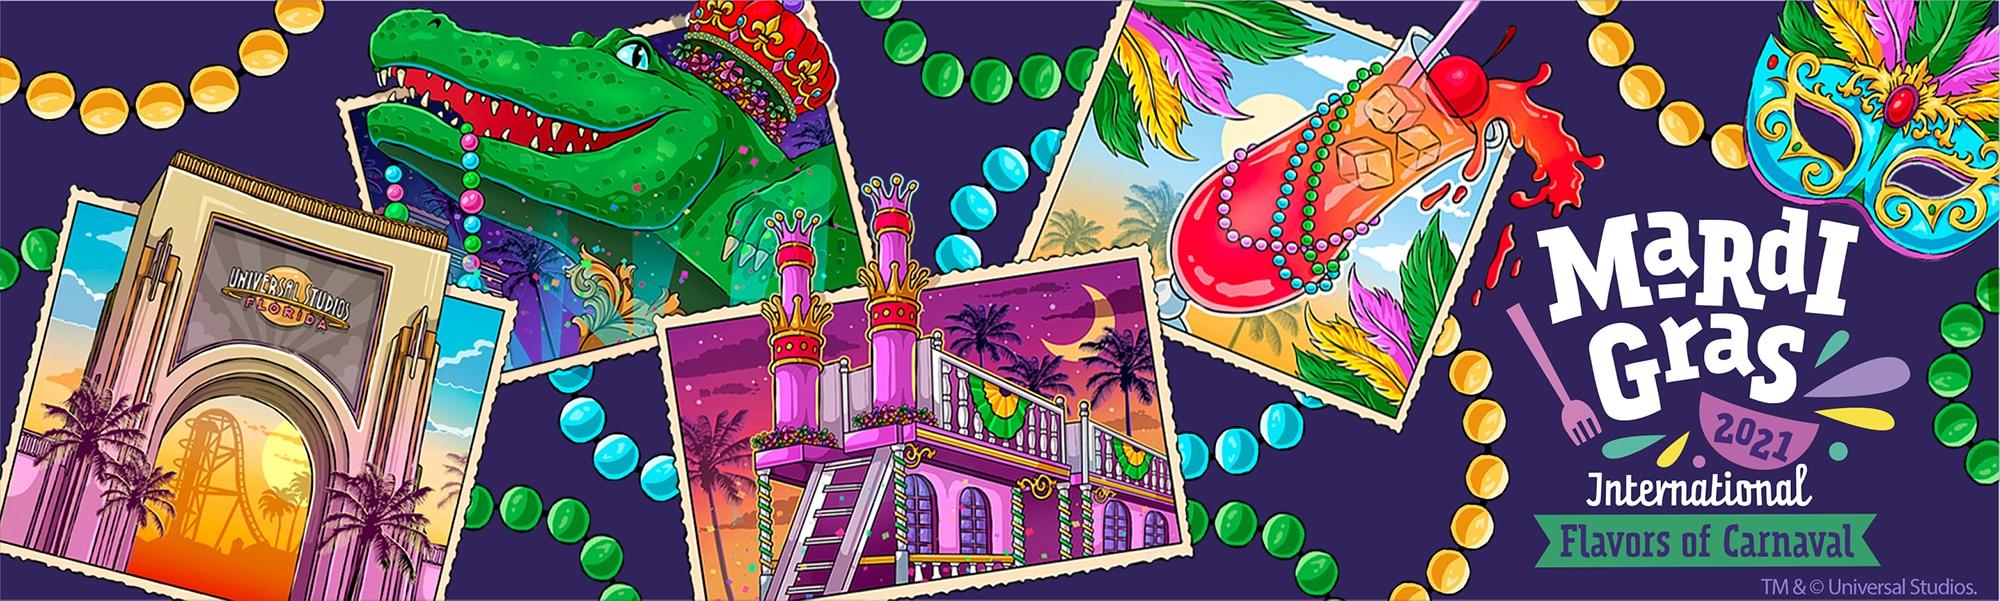 Shop Mardi Gras Merchandise